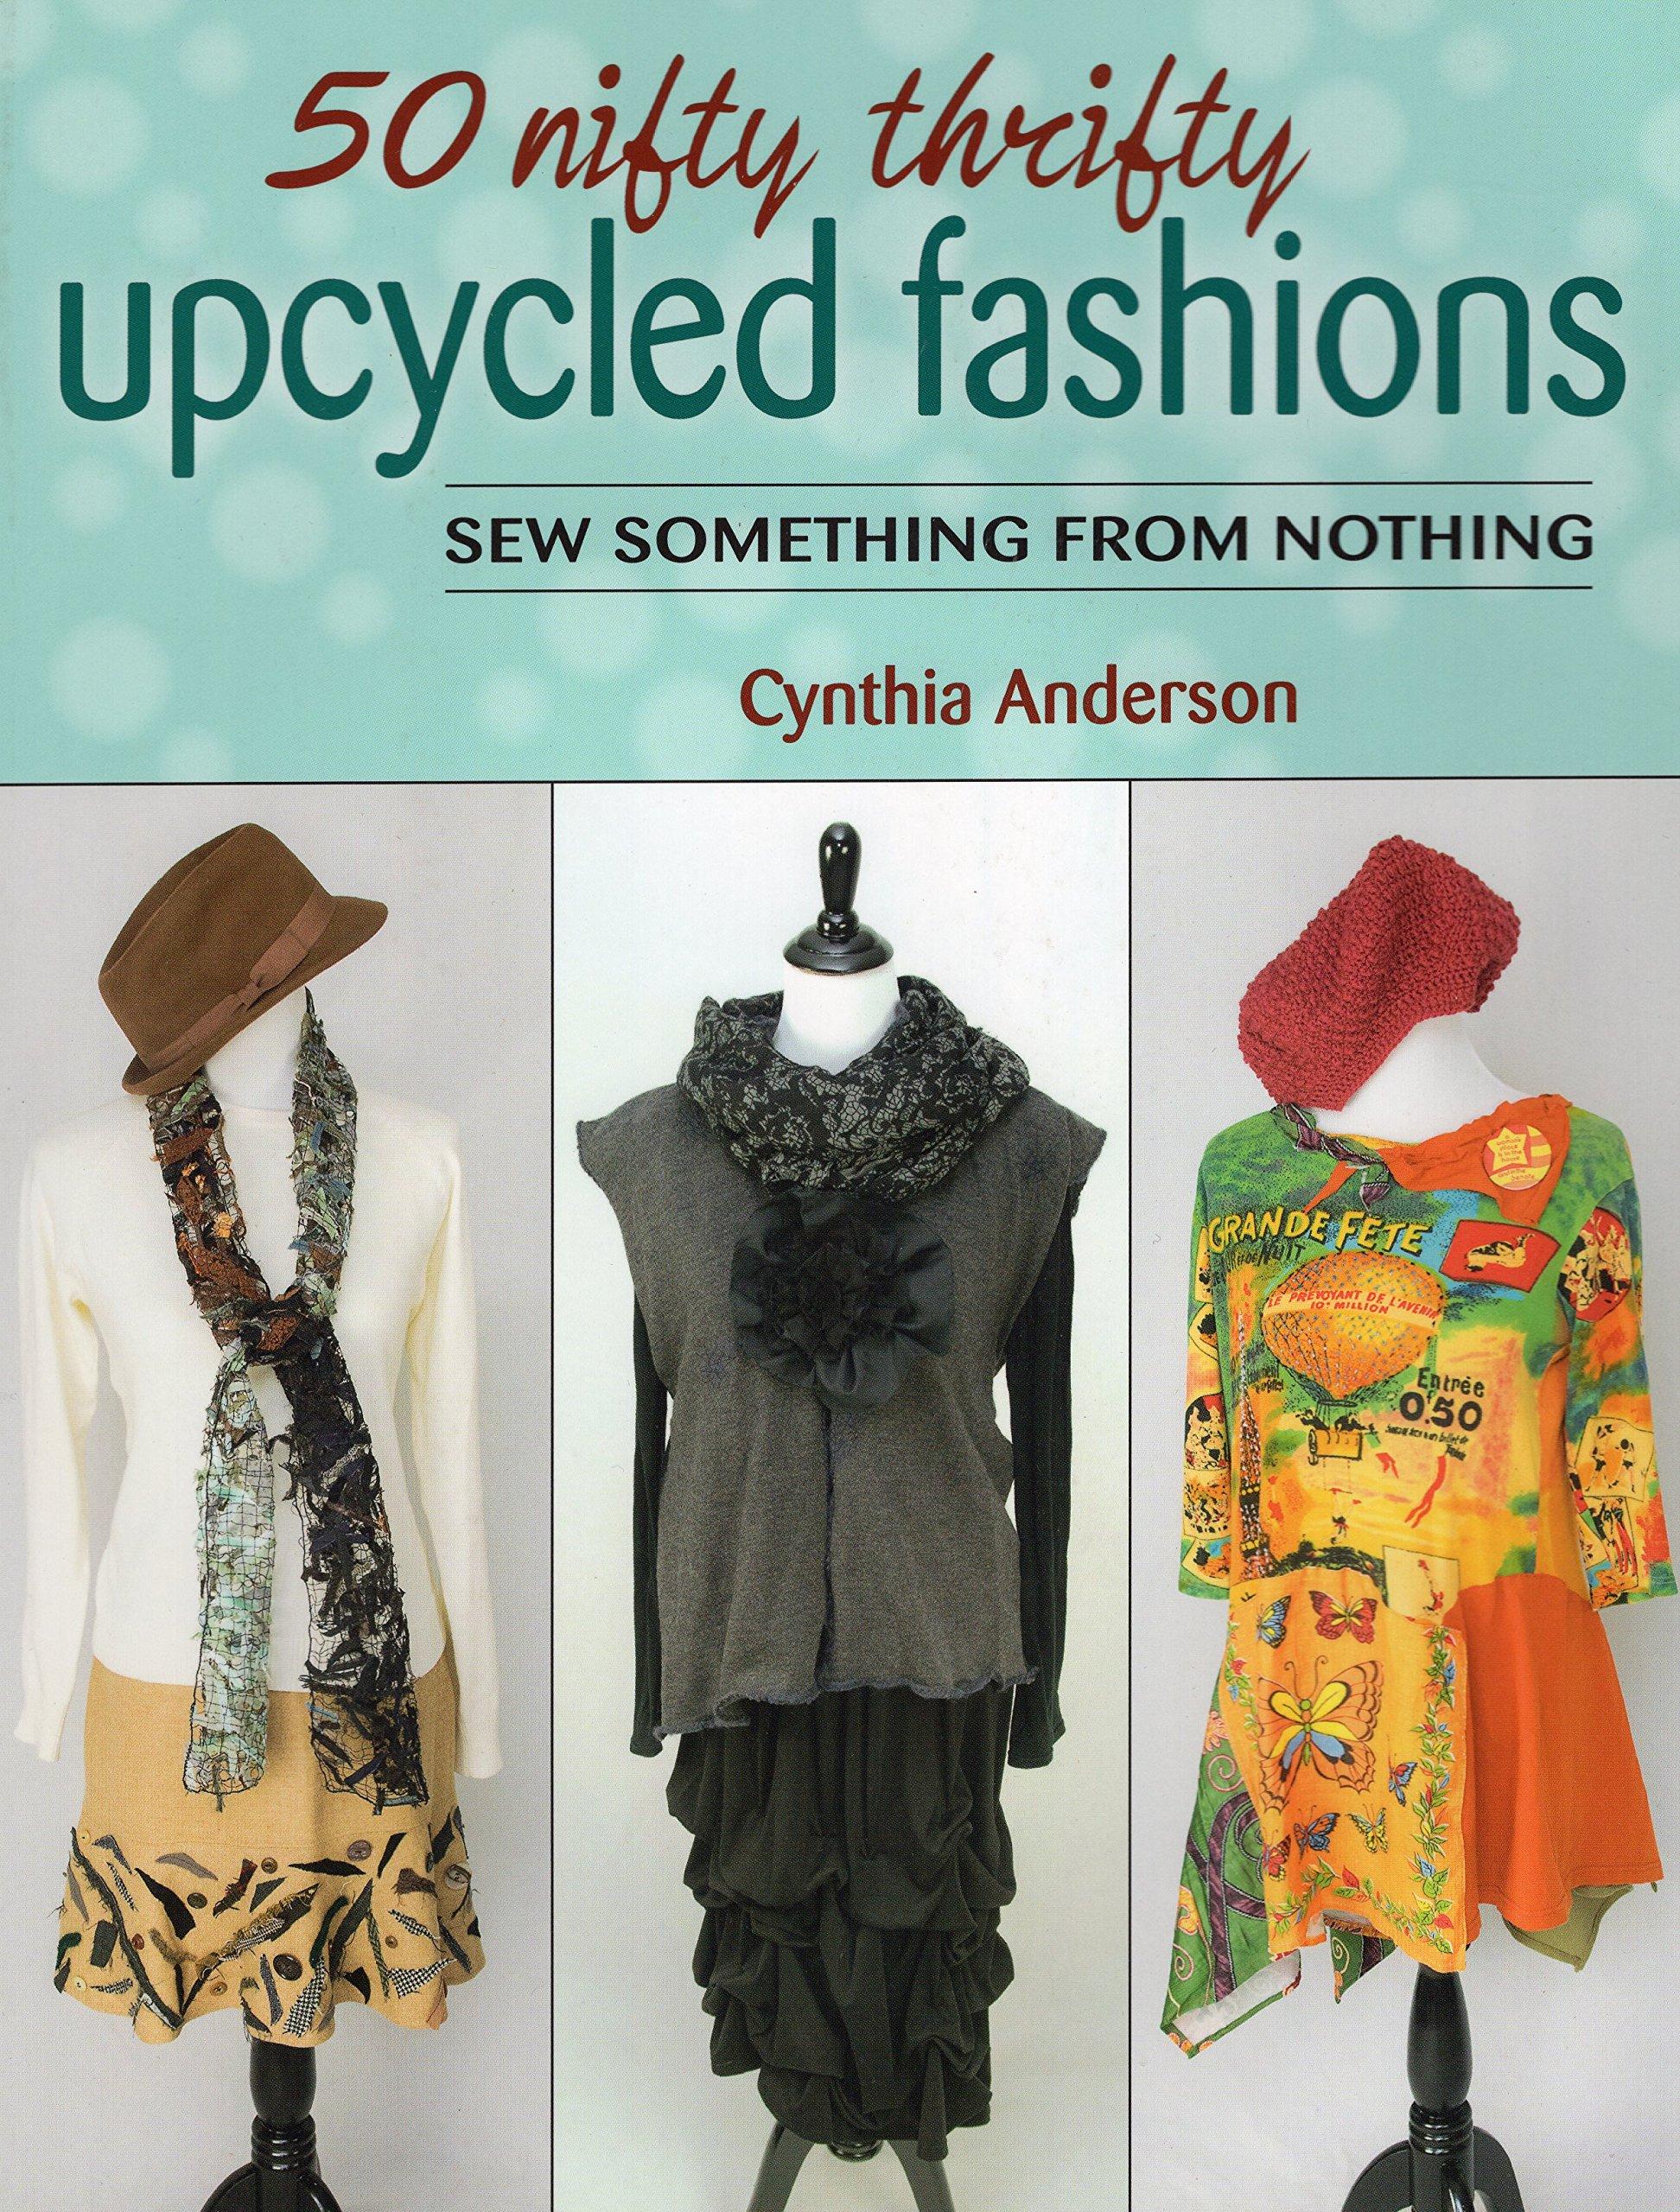 Amazoncom 50 Nifty Thrifty Upcycled Fashions Sew